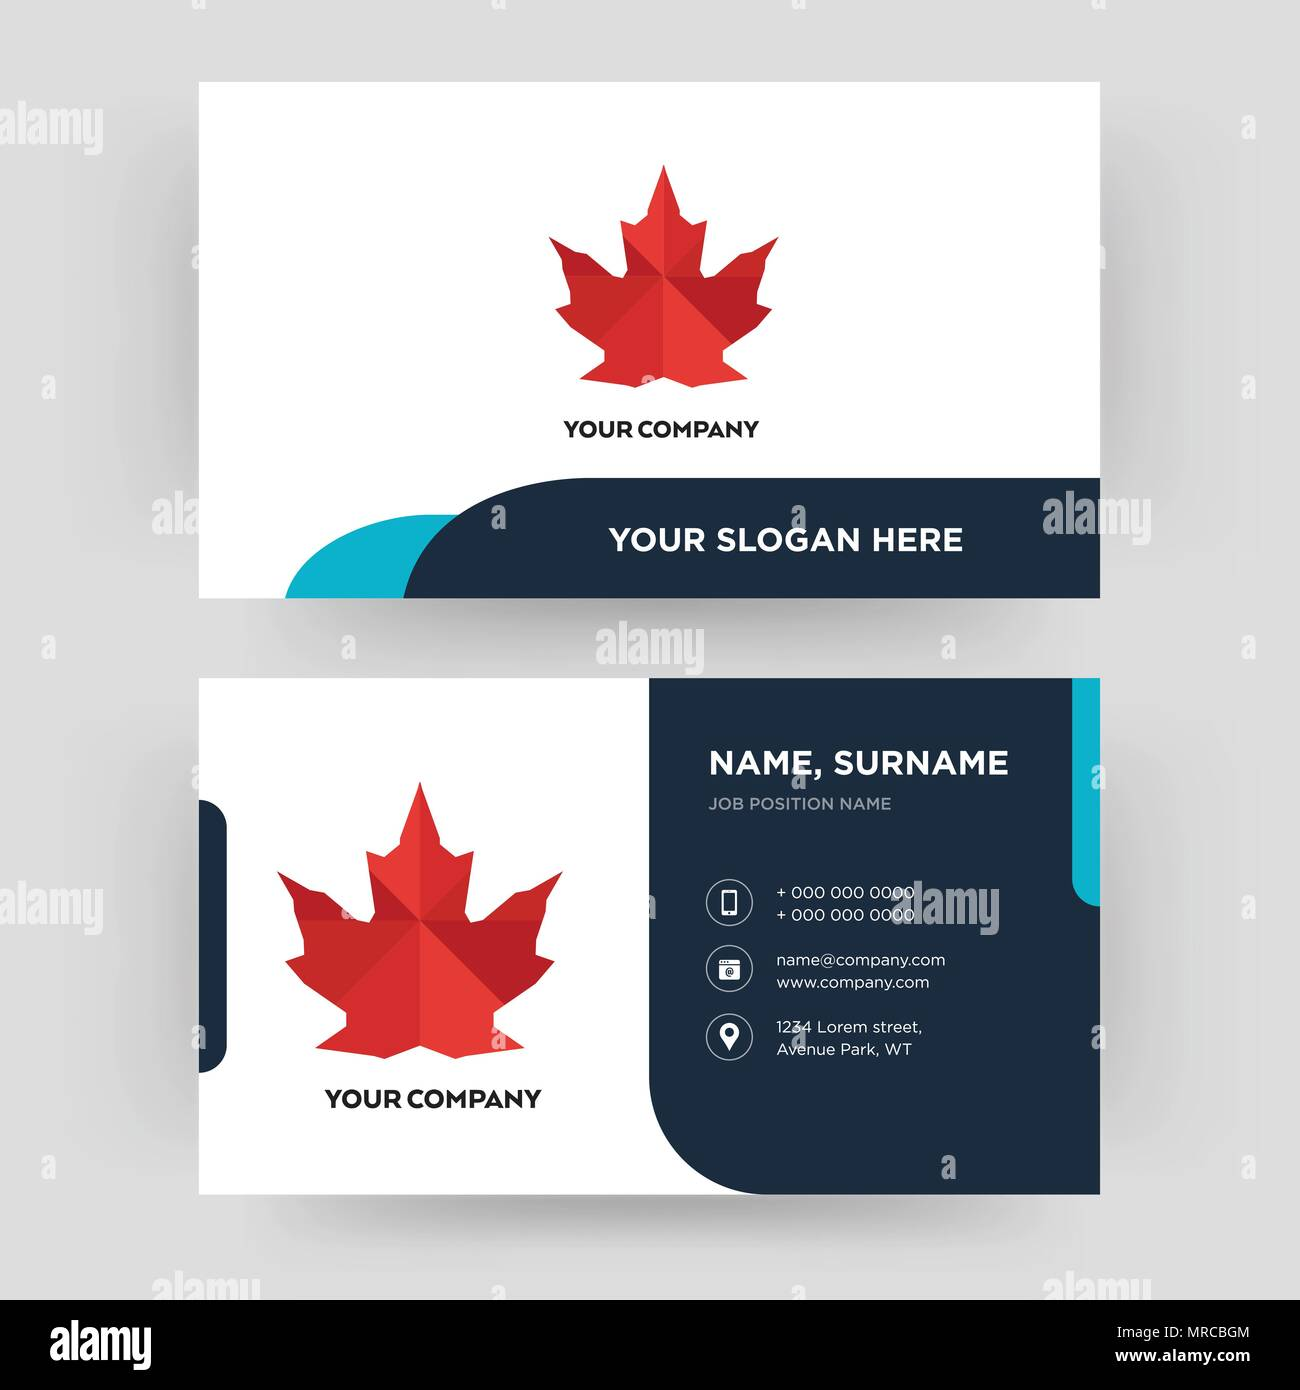 Canada leaf business card design template visiting for your canada leaf business card design template visiting for your company modern creative and clean identity card vector colourmoves